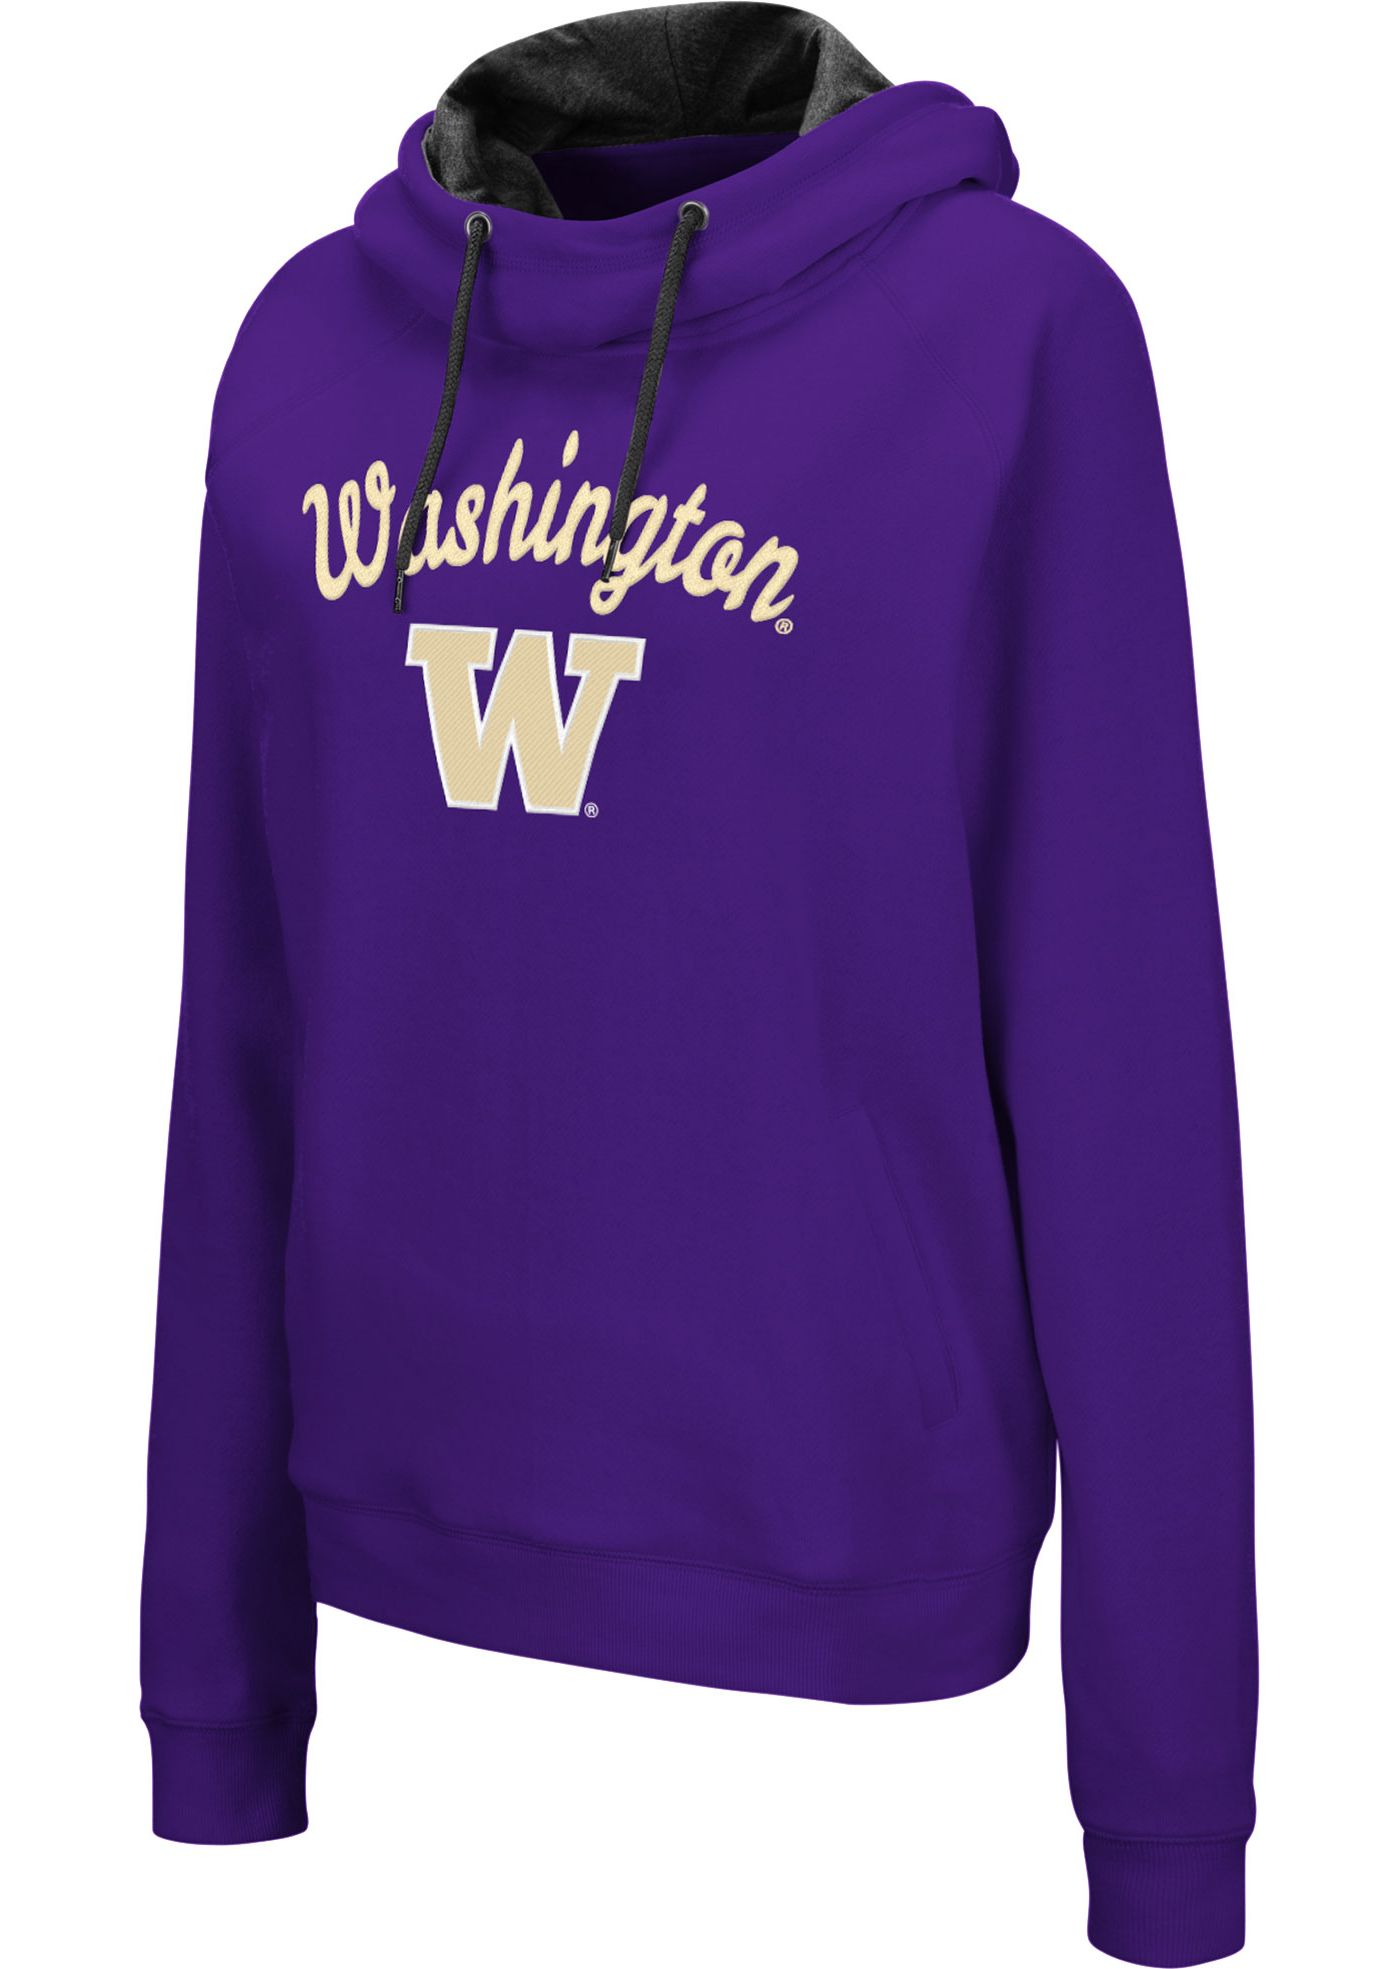 Colosseum Women's Washington Huskies Purple Louise Pullover Sweatshirt